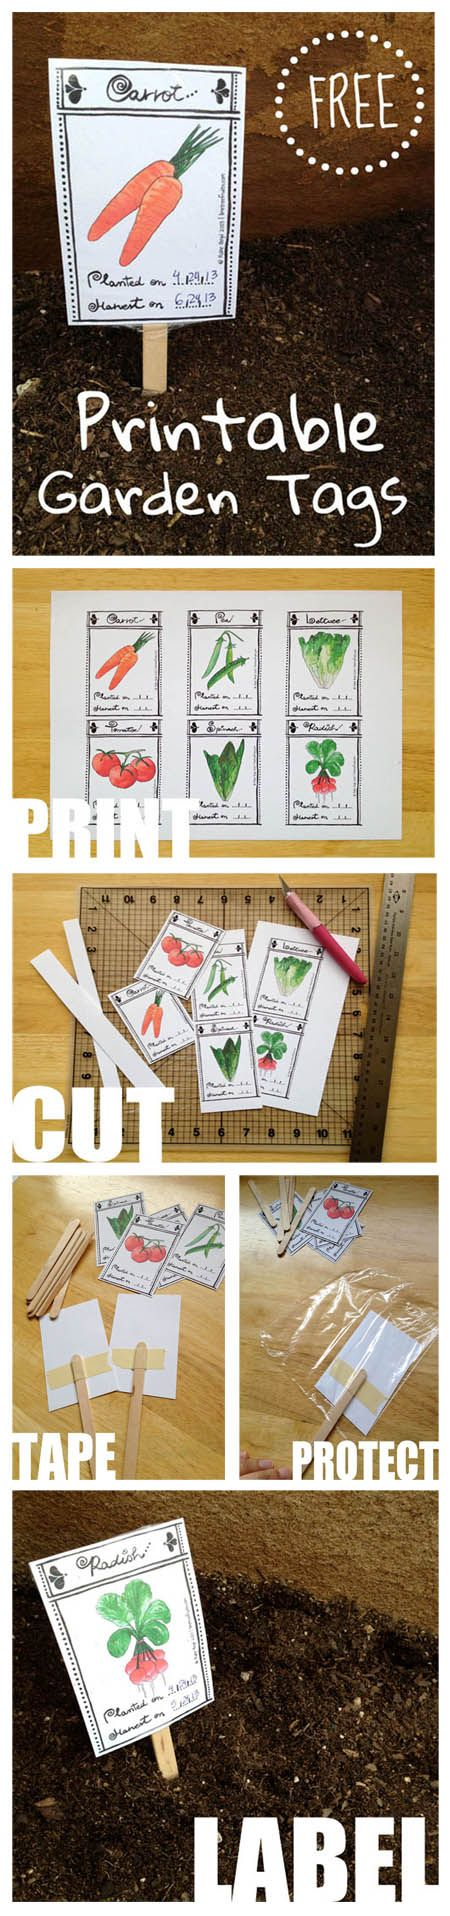 http://www.limetreefruits.com/garden-labels/ FREE Printable Garden Tags